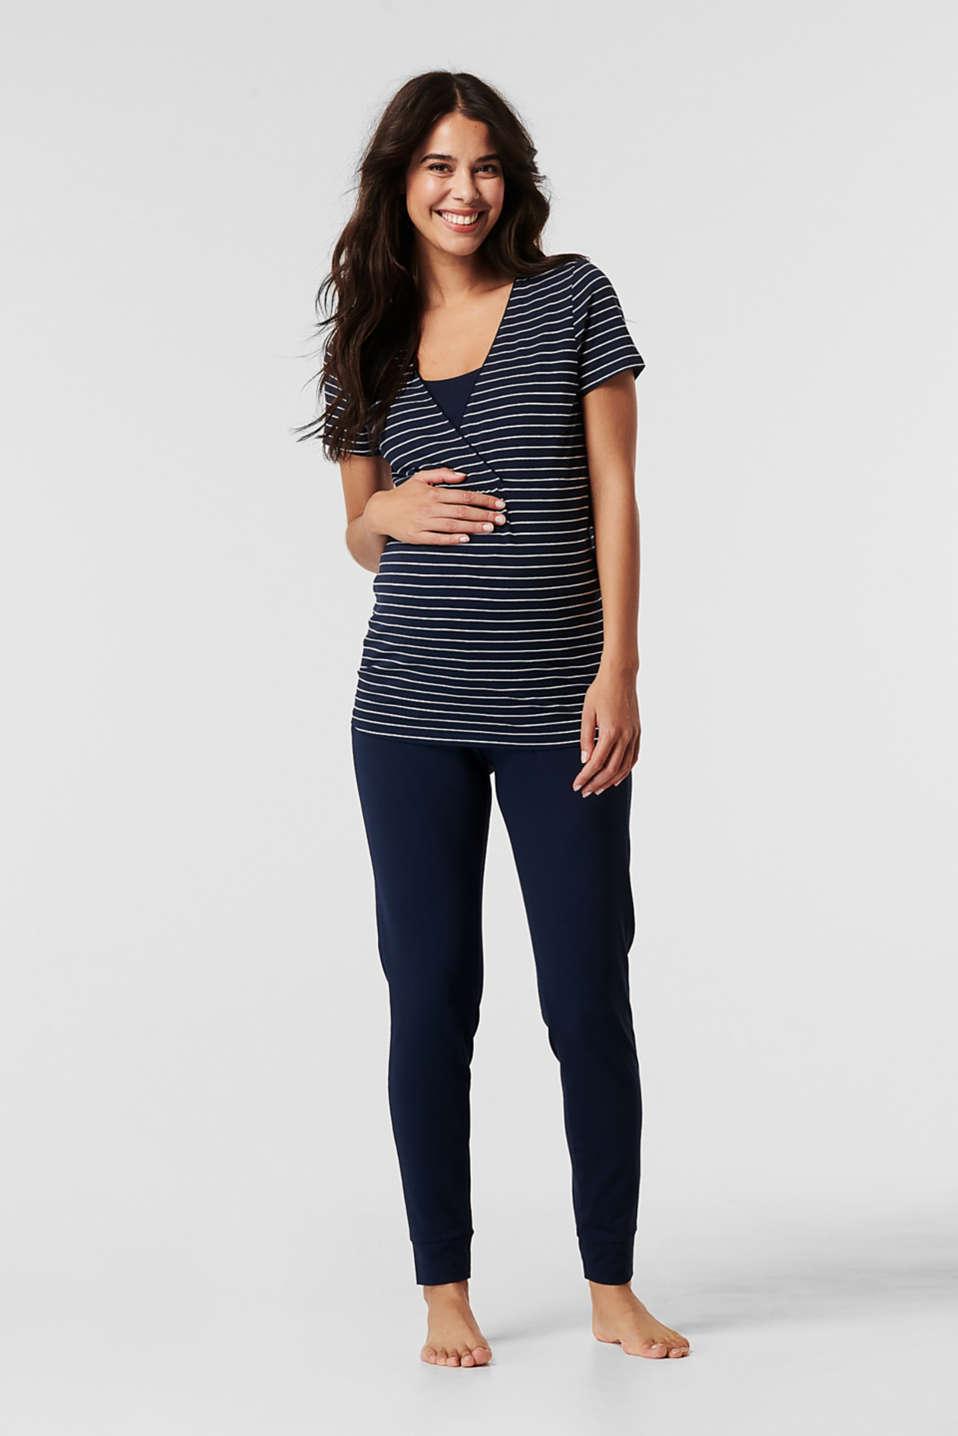 Stretch jersey pyjamas with a nursing function